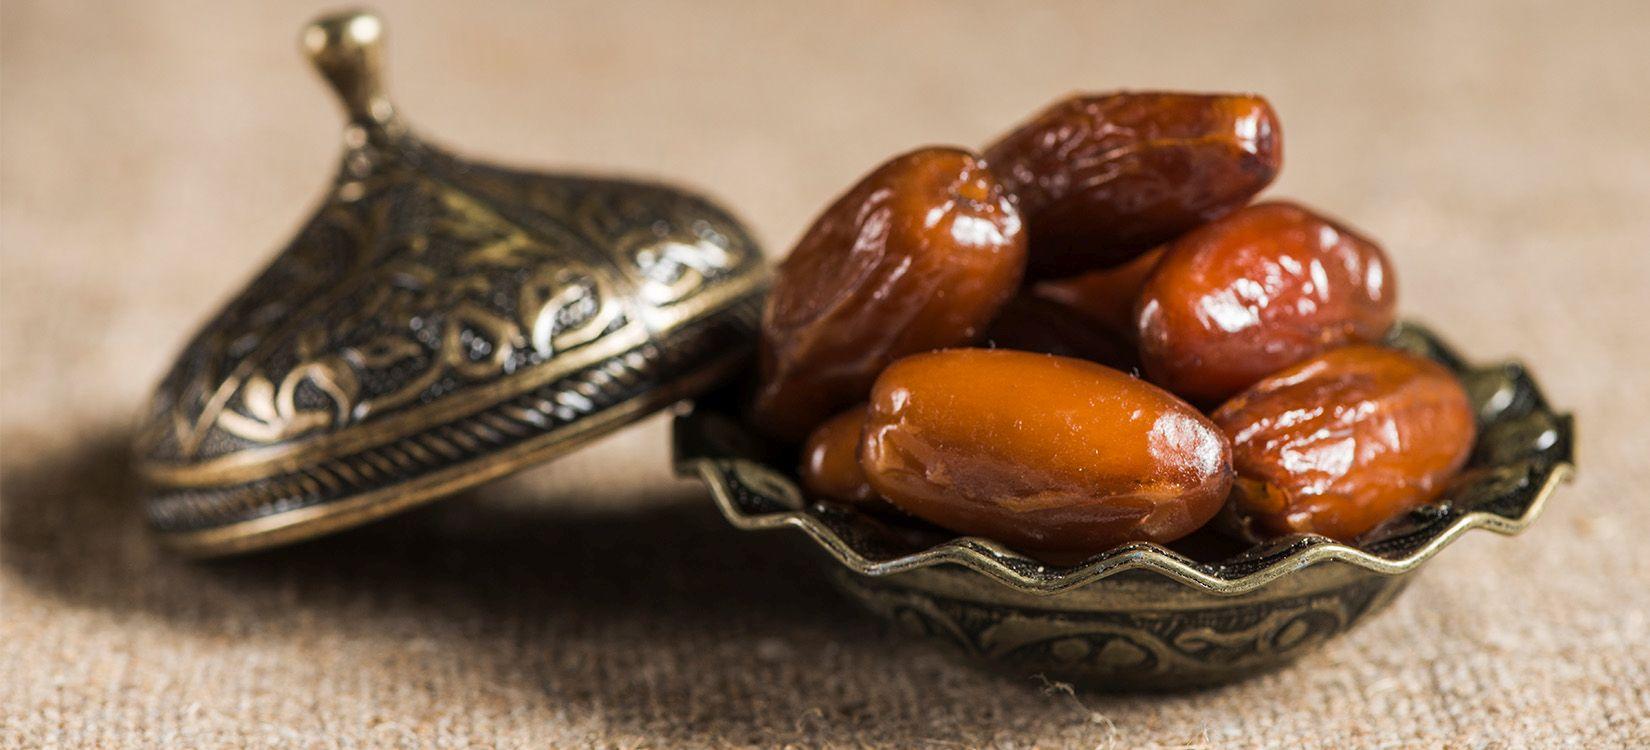 Ramazan Dova Molitva Iftar